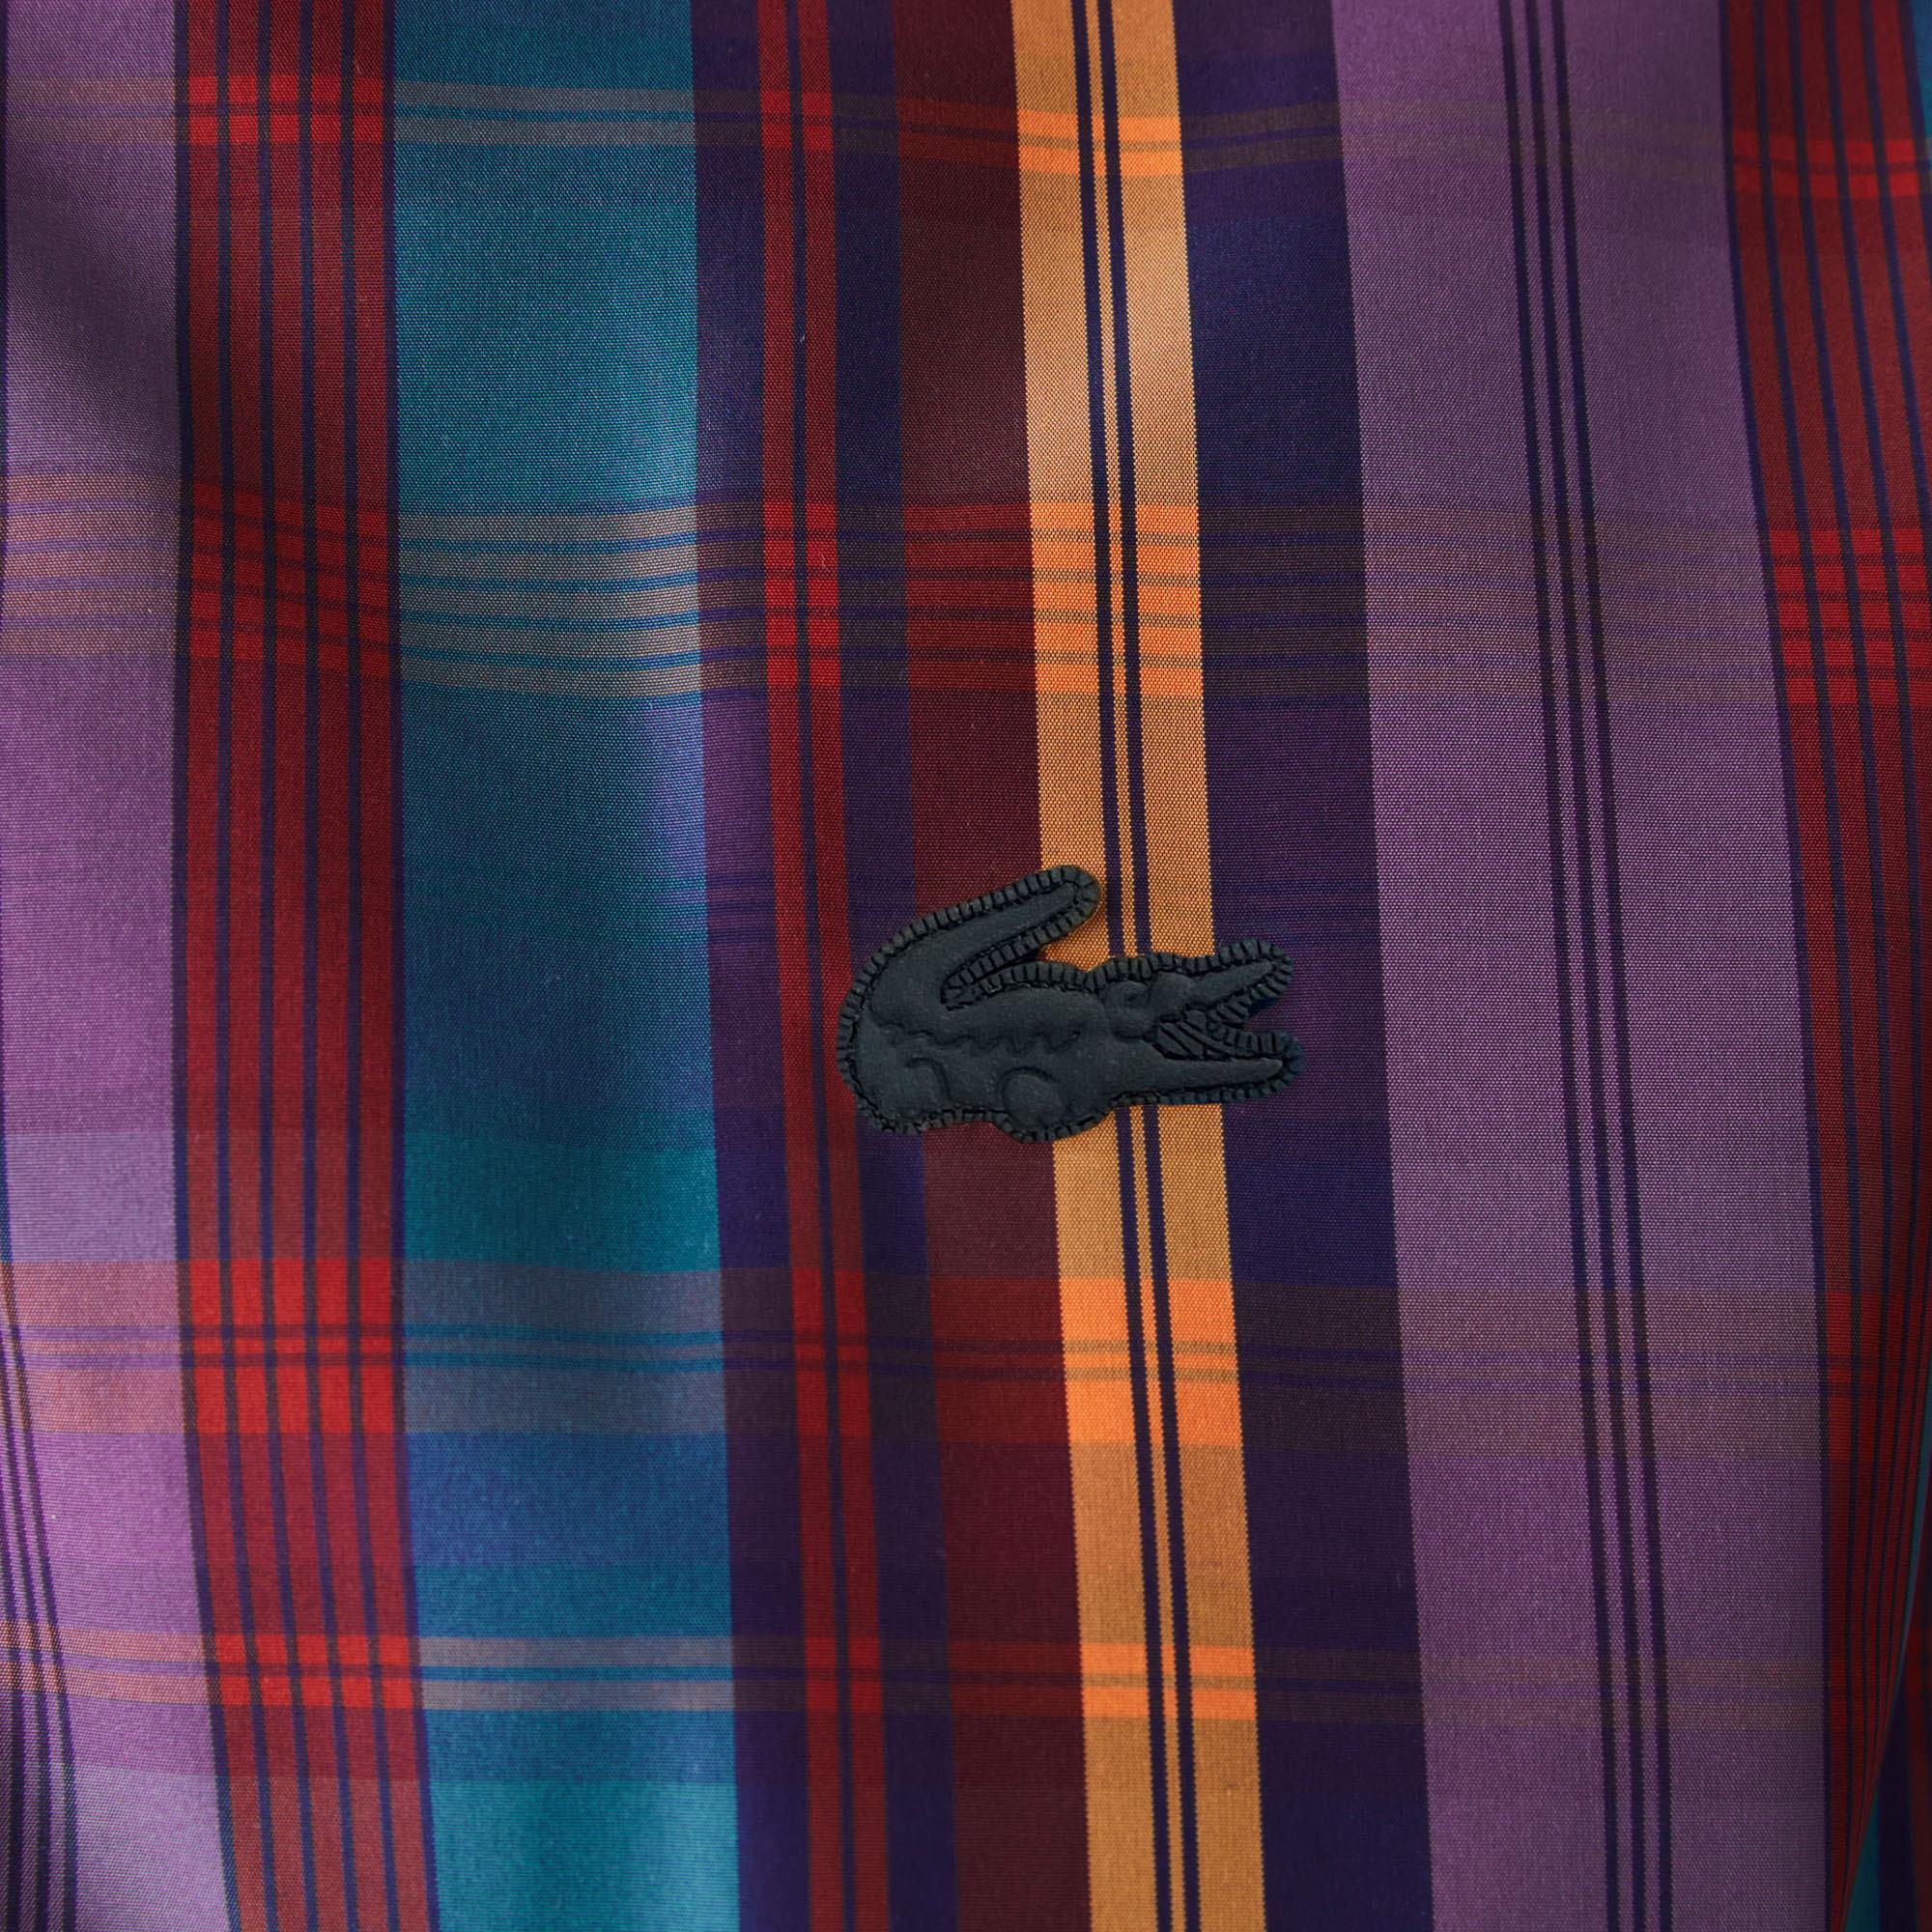 Lacoste L!ve Unisex Kapüşonlu Desenli Renkli Mont